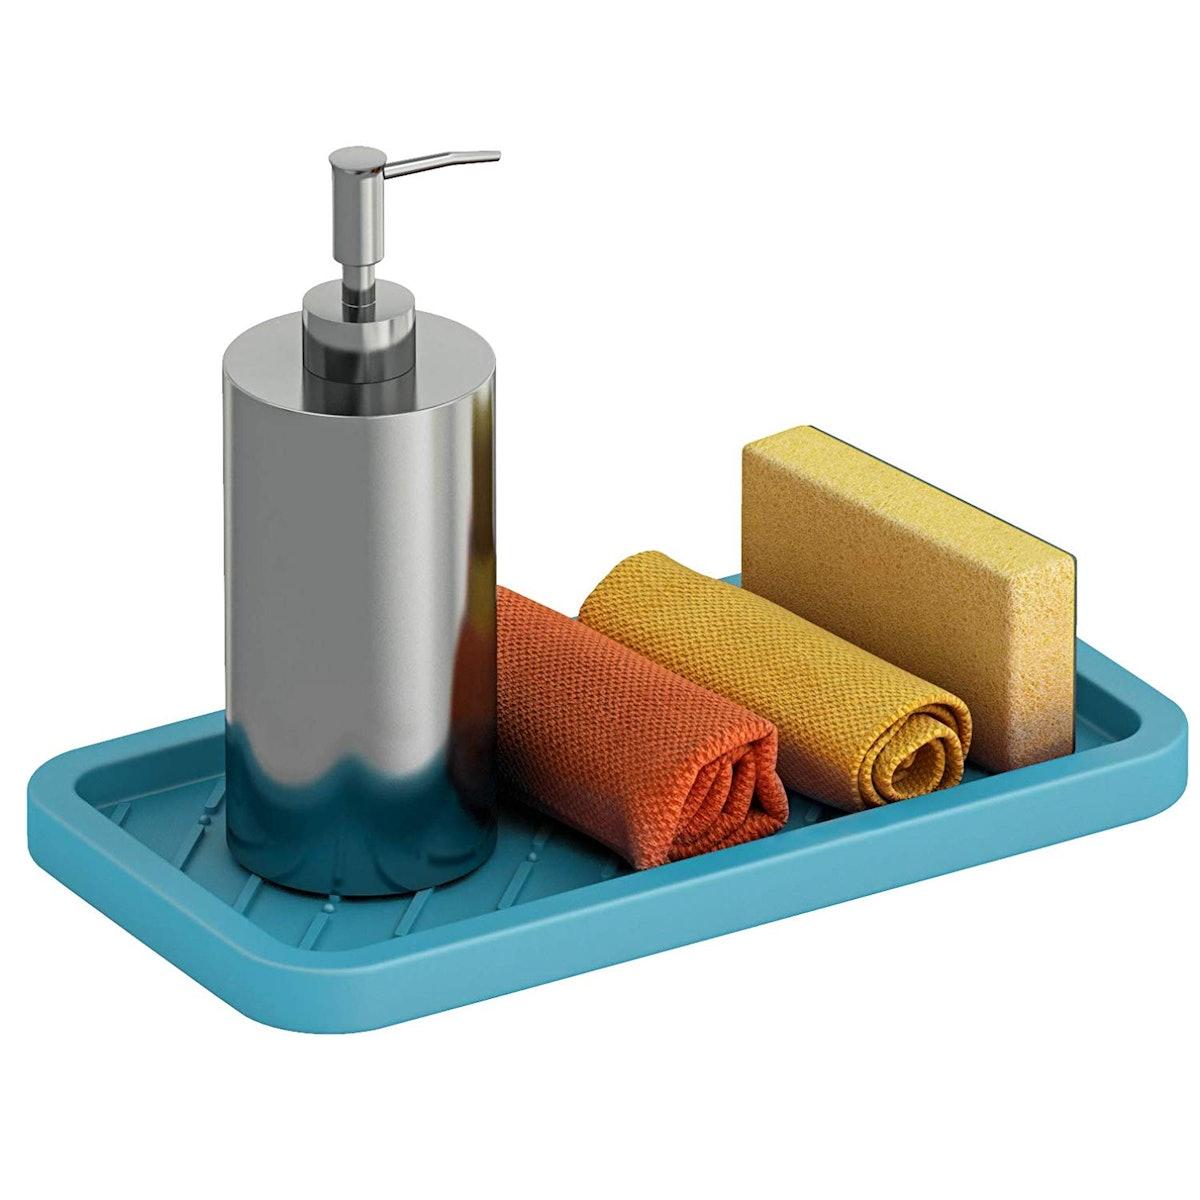 Comfify Silicone Sink Tray Organizer